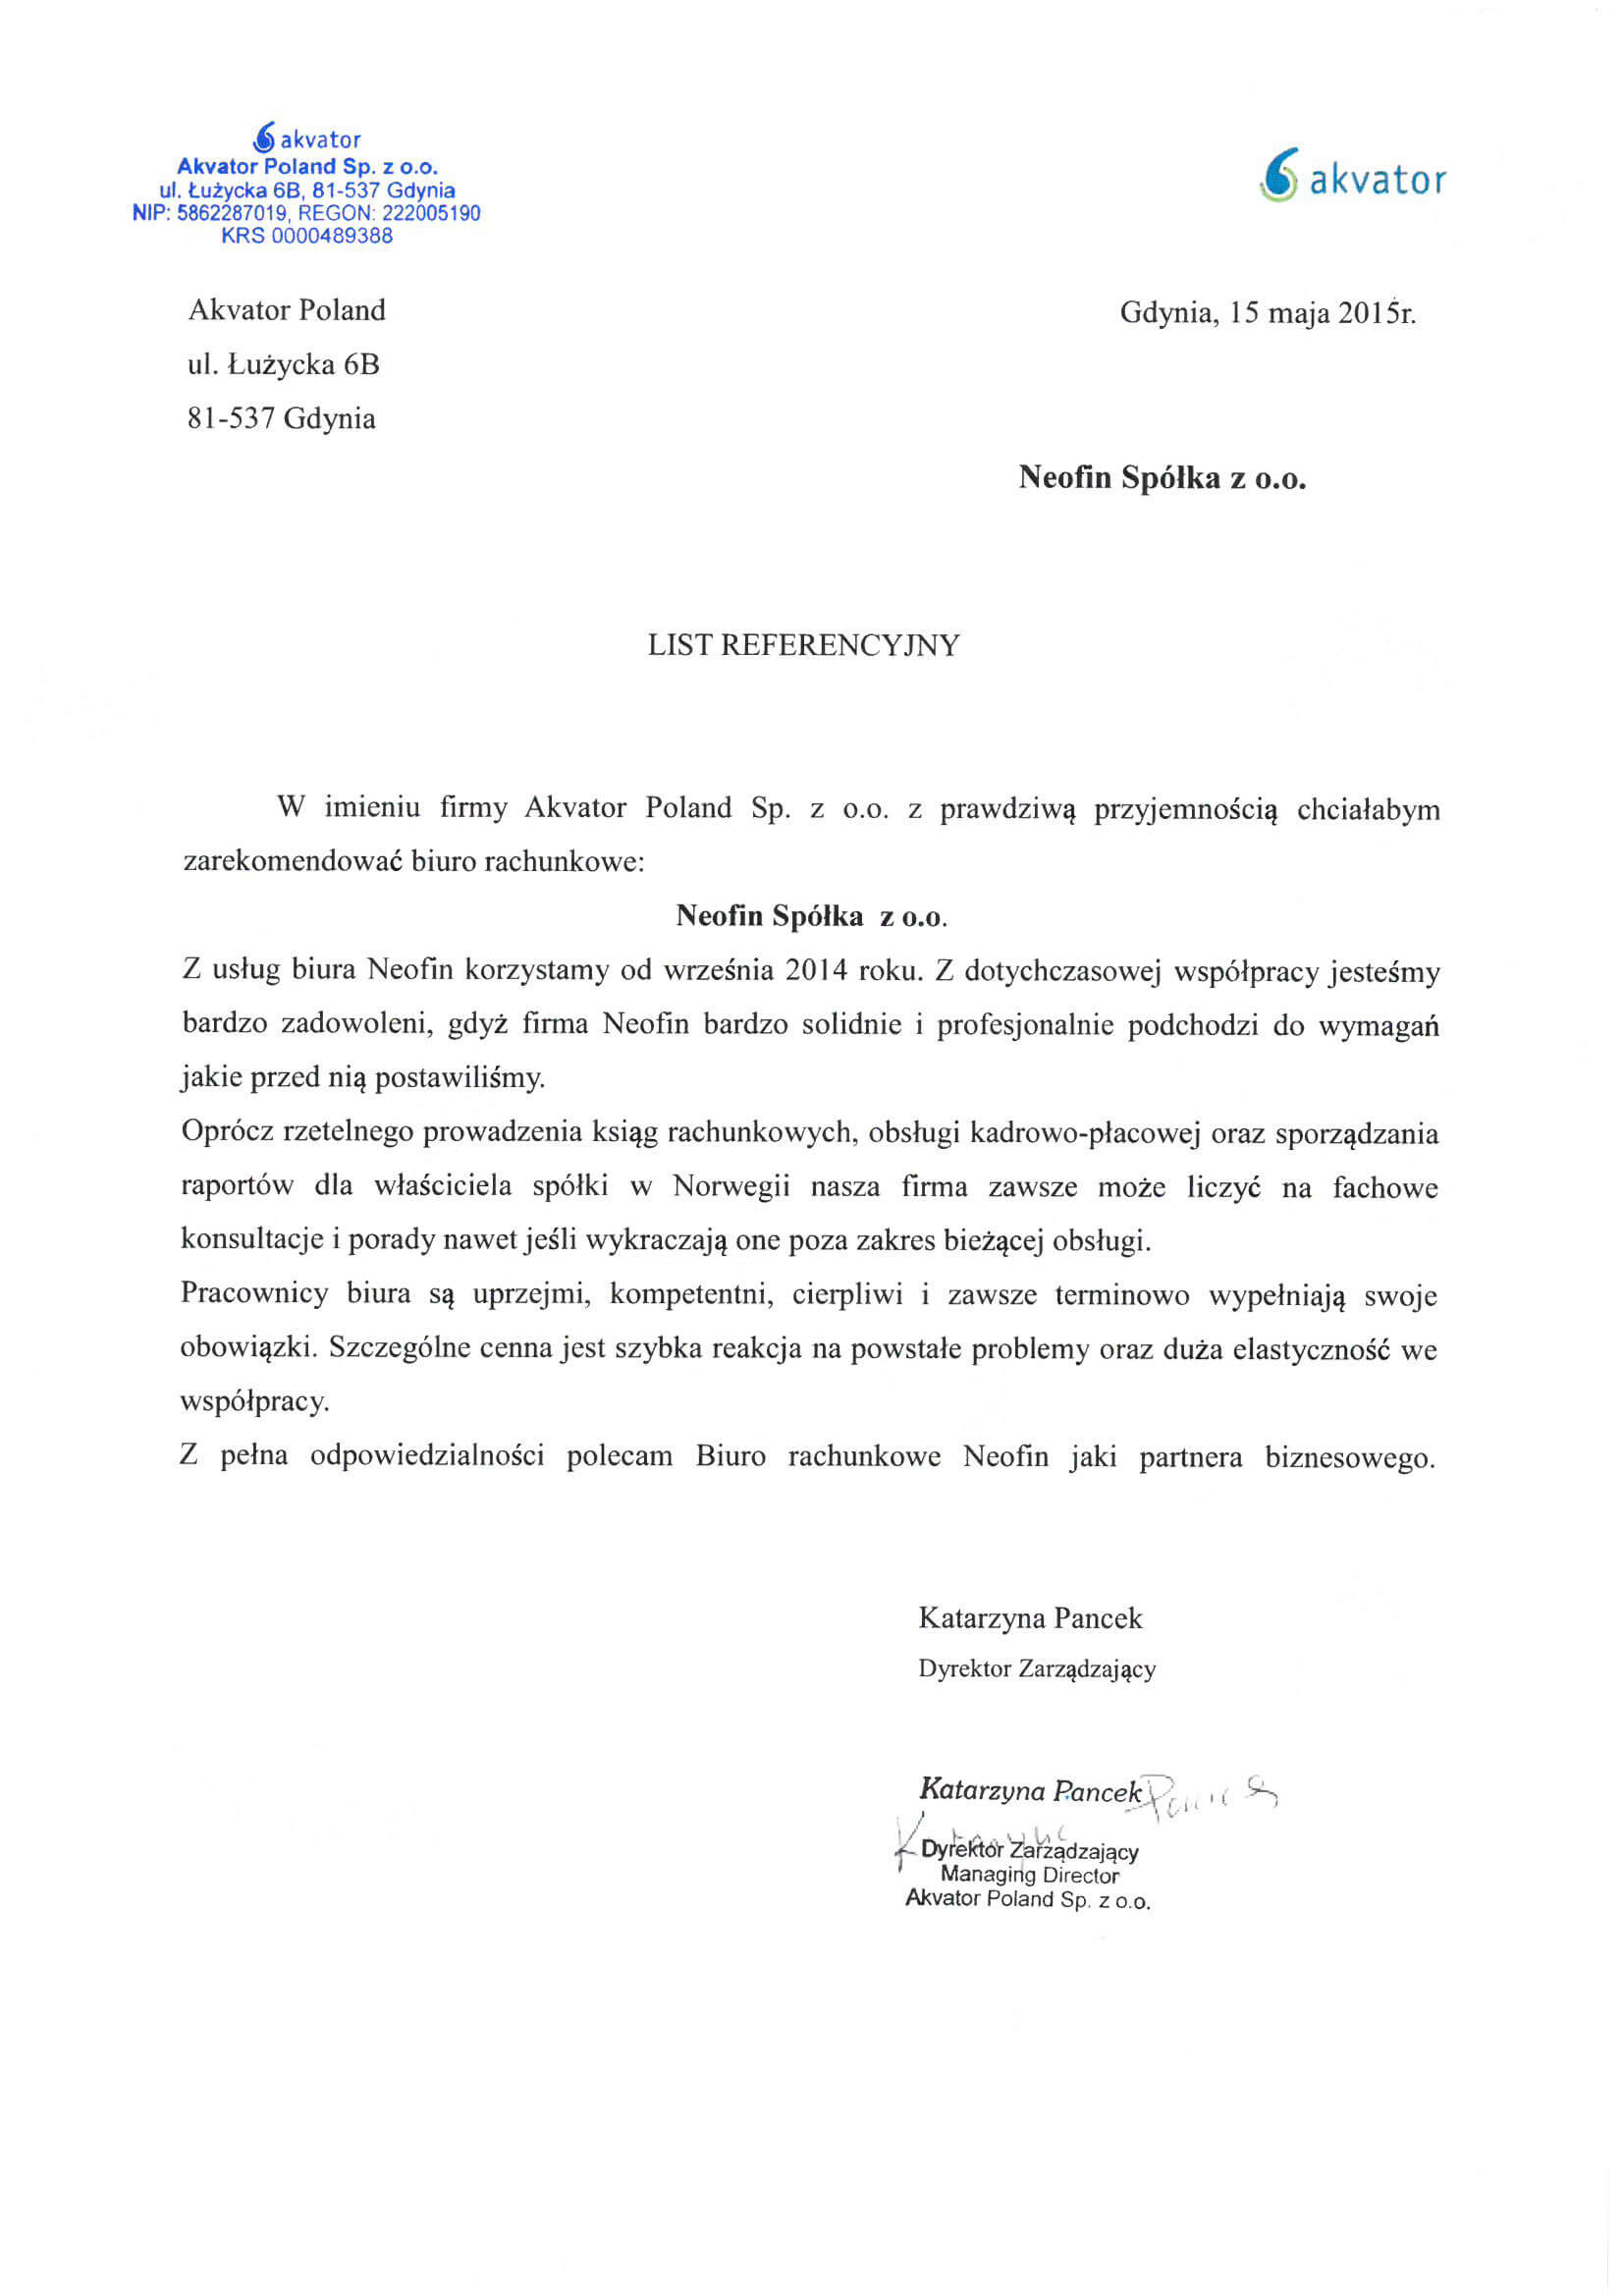 Referencje dla Neofin od Akvator Poland Sp. z o. o.